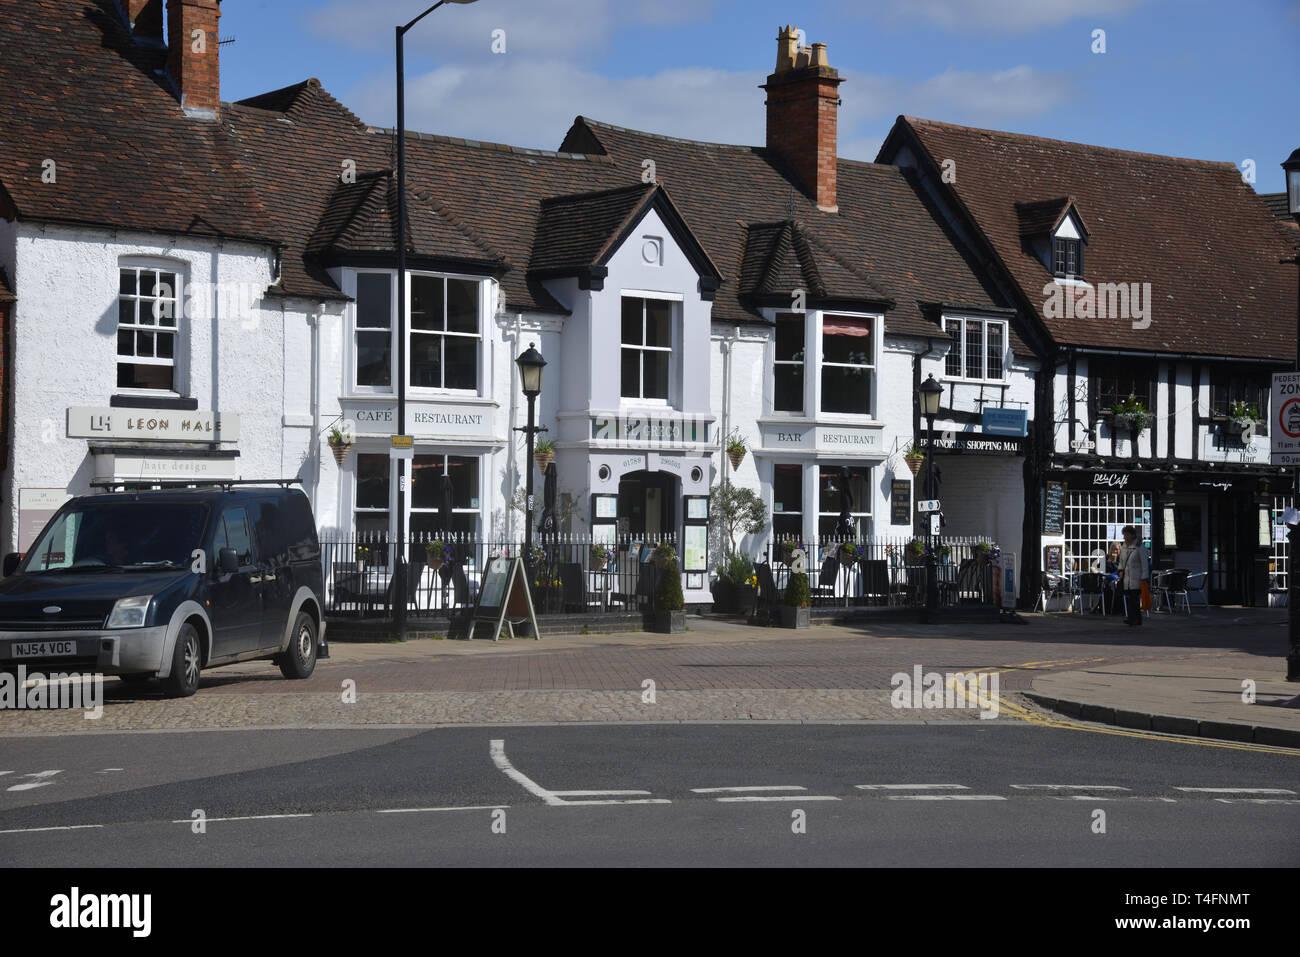 El Greco Restaurant, Meer Street, Stratford upon Avon, Warwickshire Stock Photo